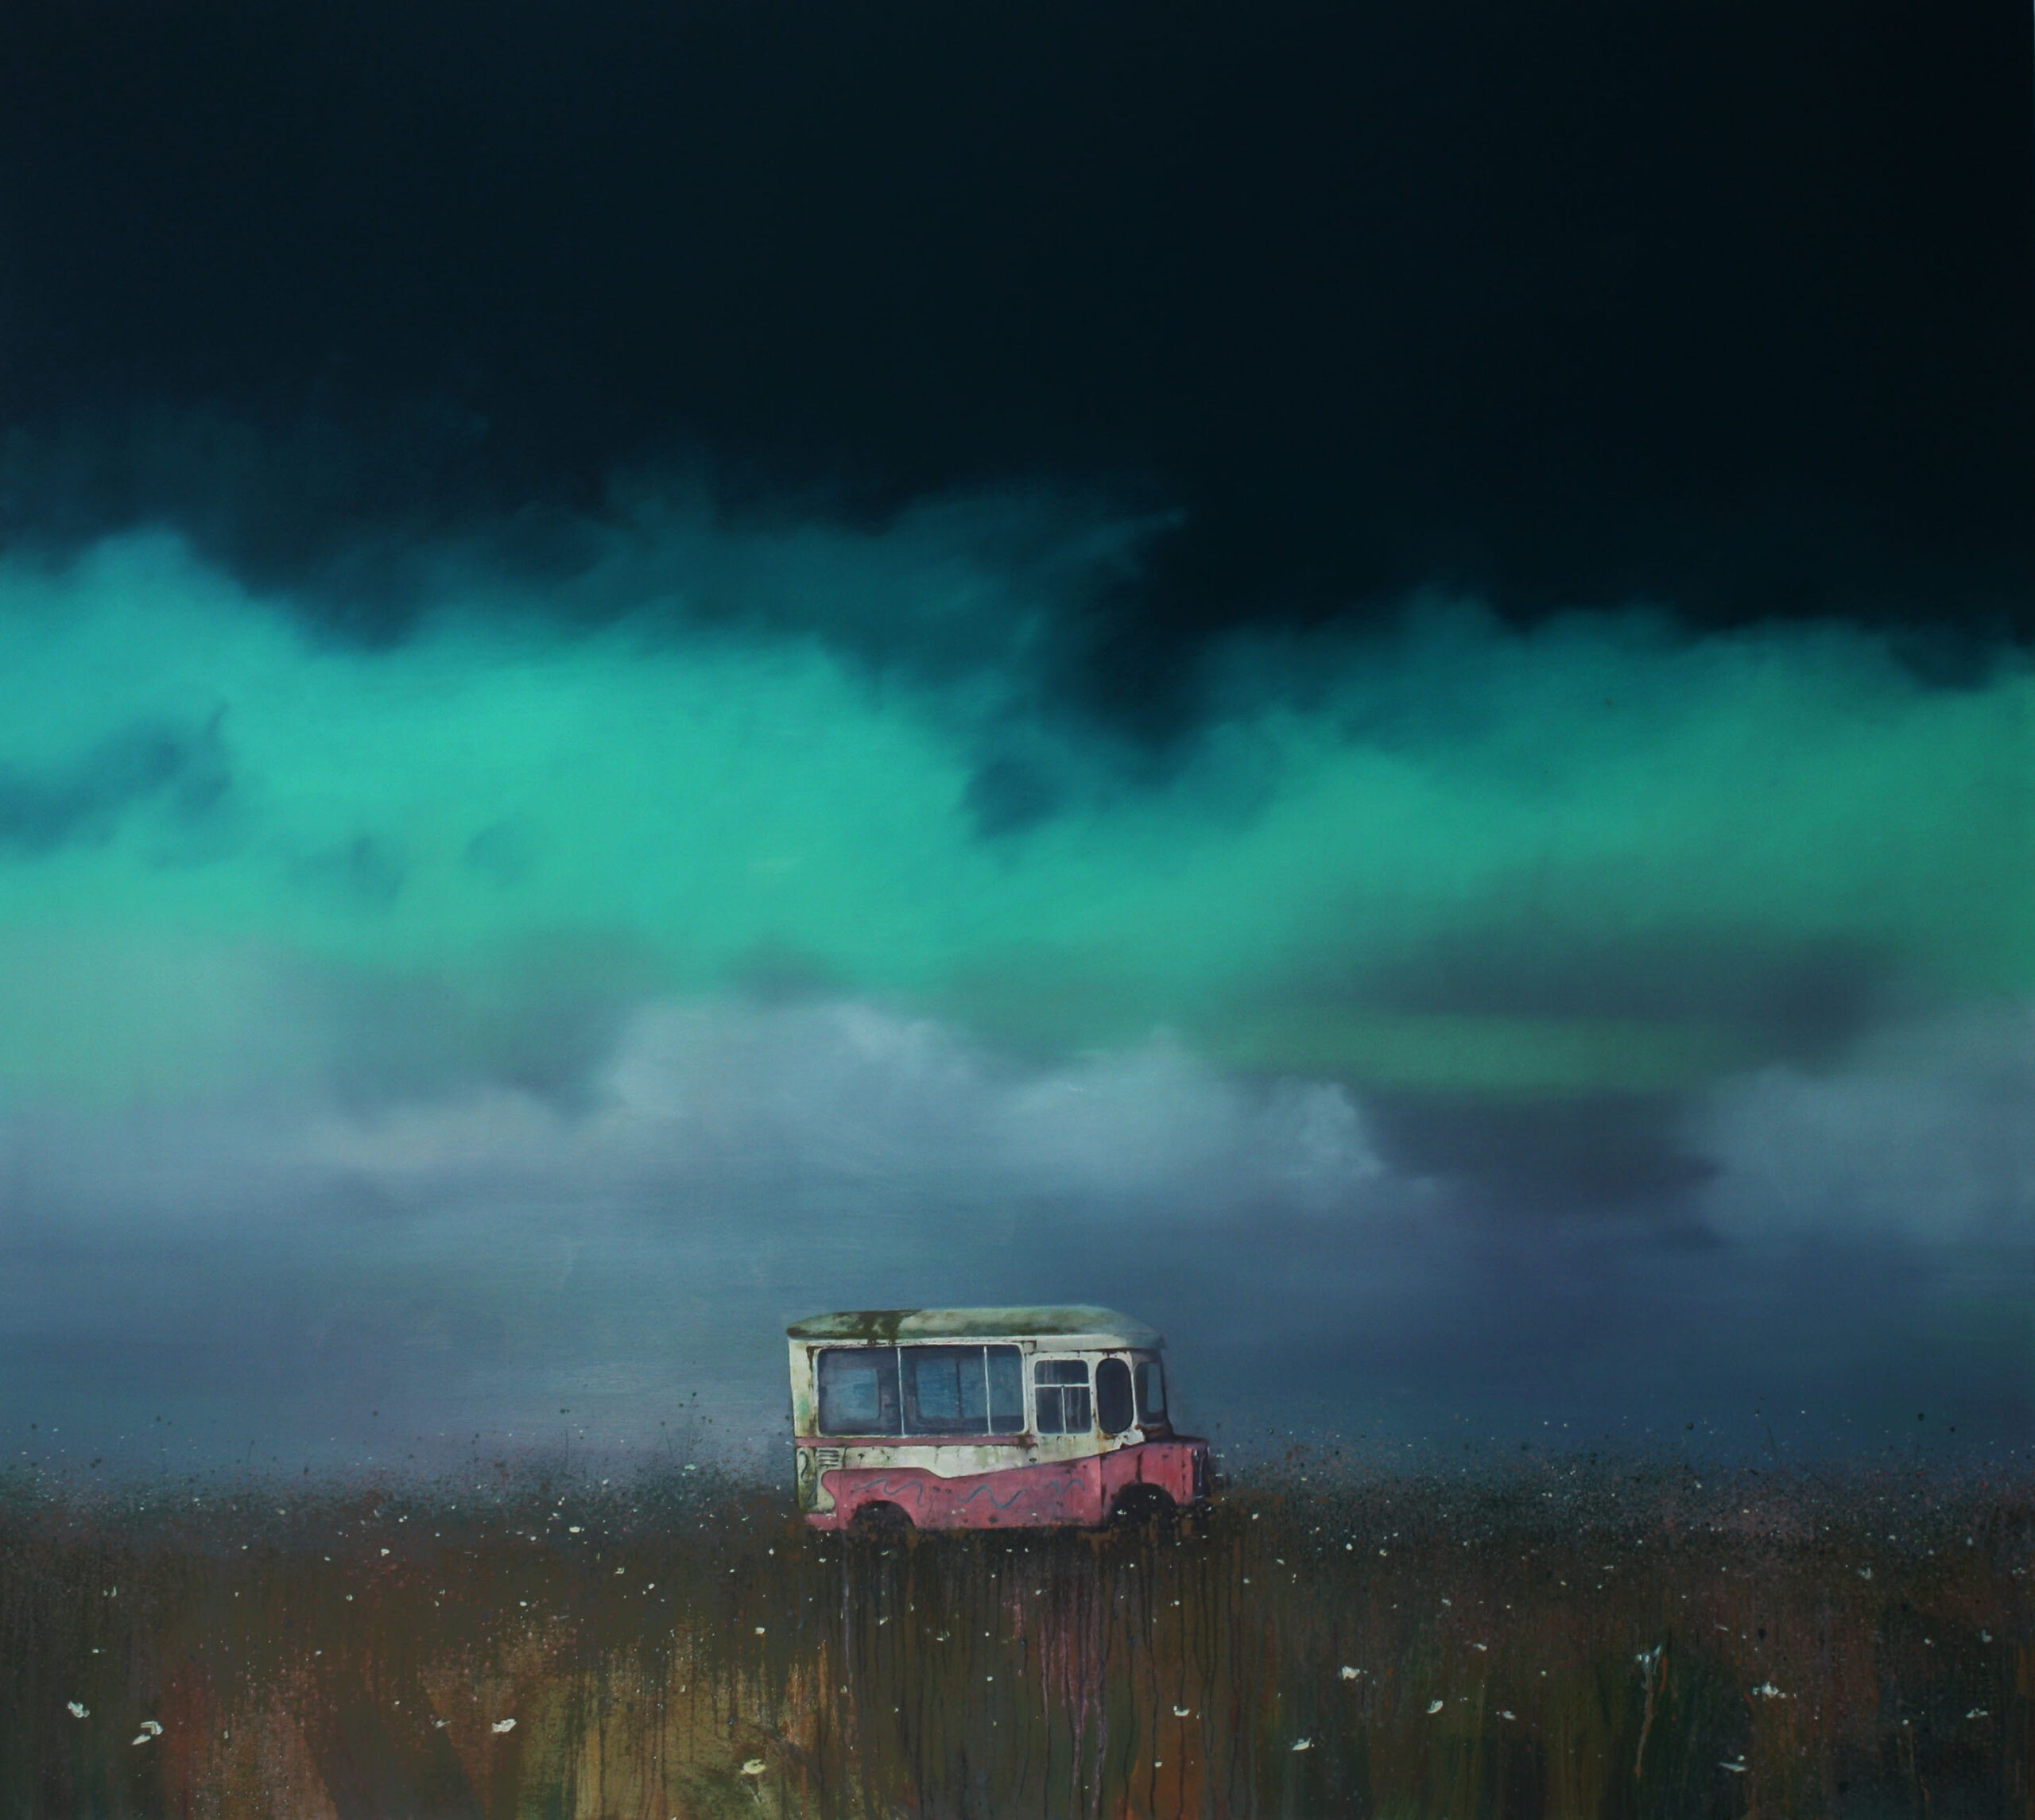 Redundant 135 x 150 cm oil on canvas